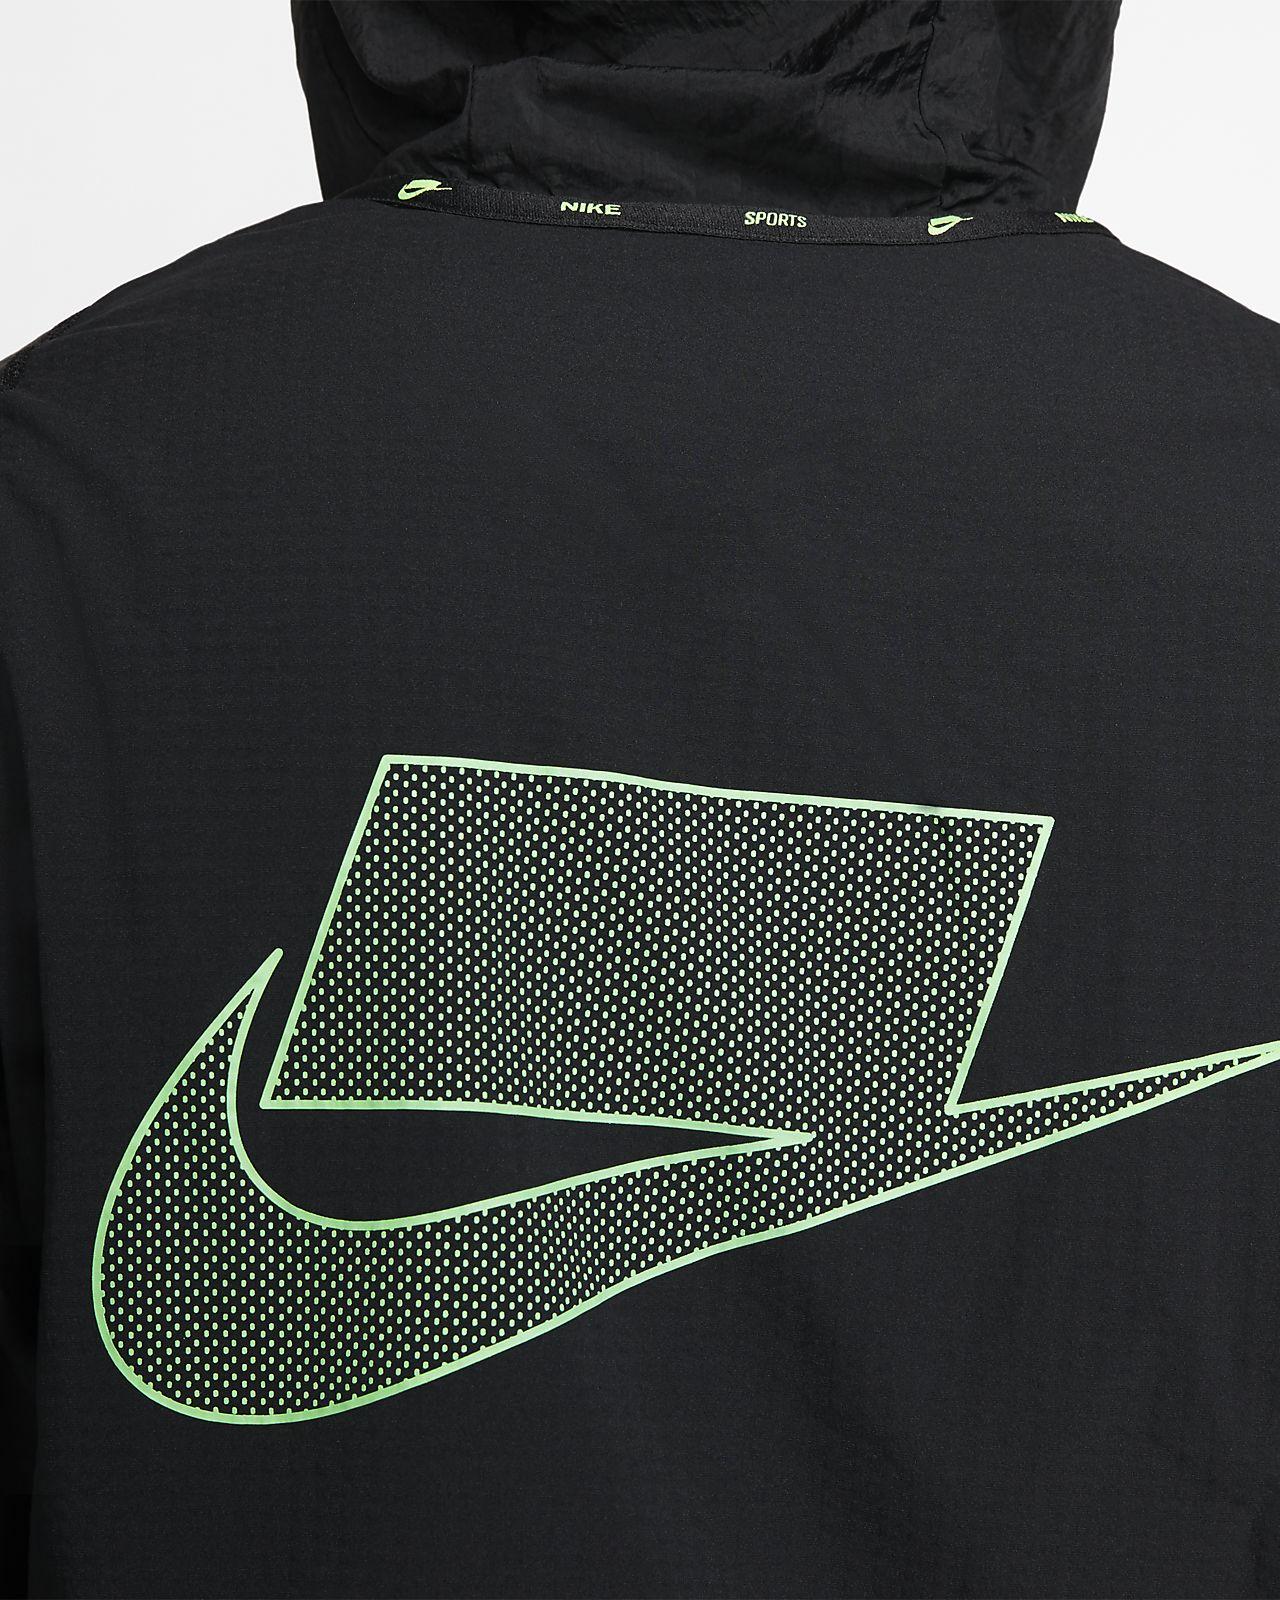 Palestra Nike Giacca Sportiva Nero Uomo BV3303 010 Acquista su Sp